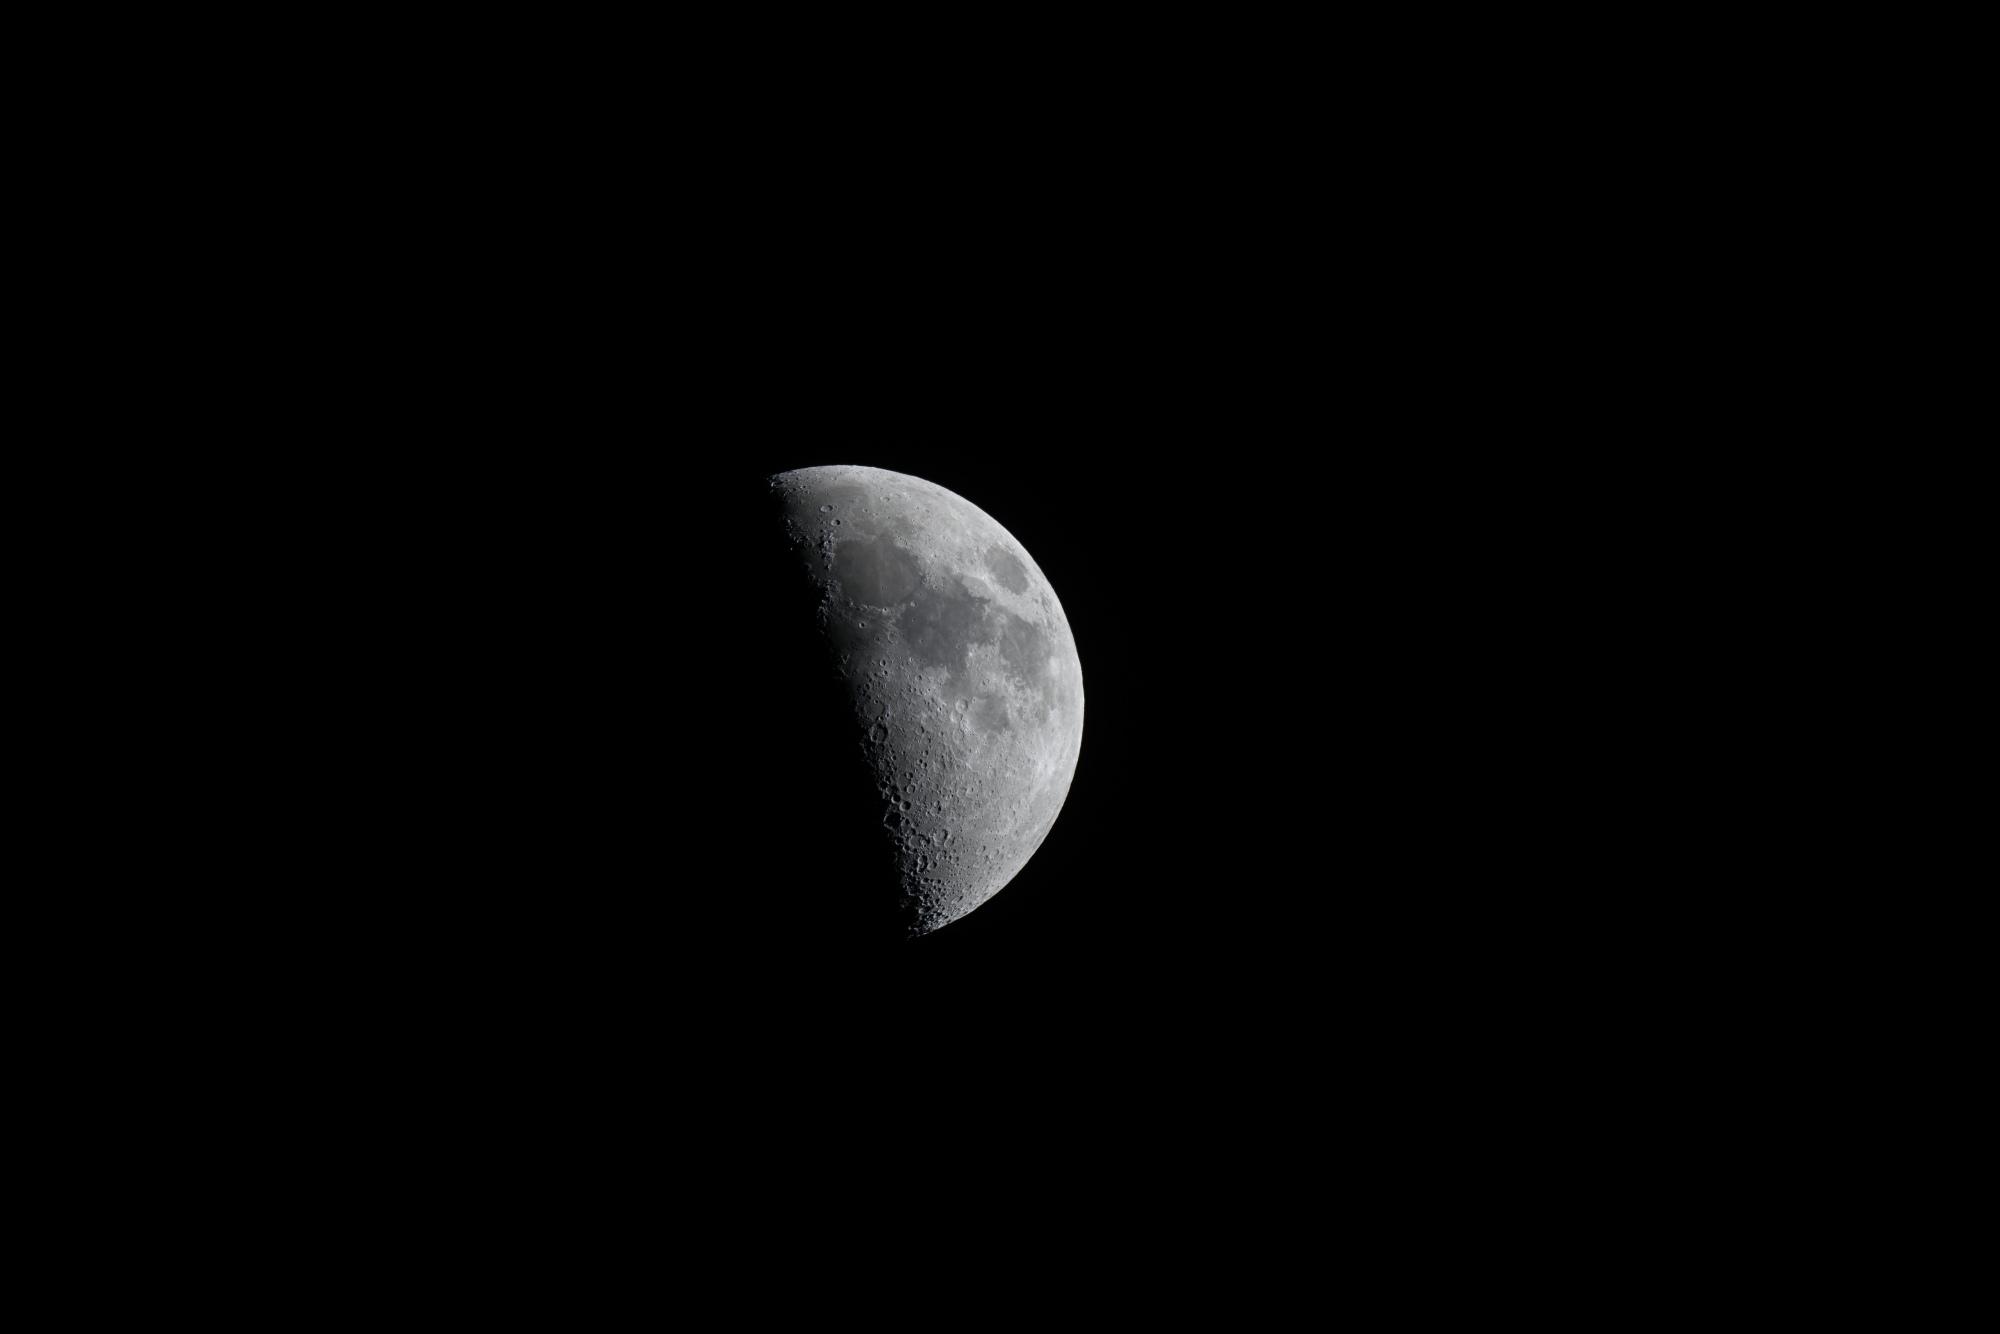 moon.thumb.jpg.c7cf1eb44ed14541001484b66ec13065.jpg